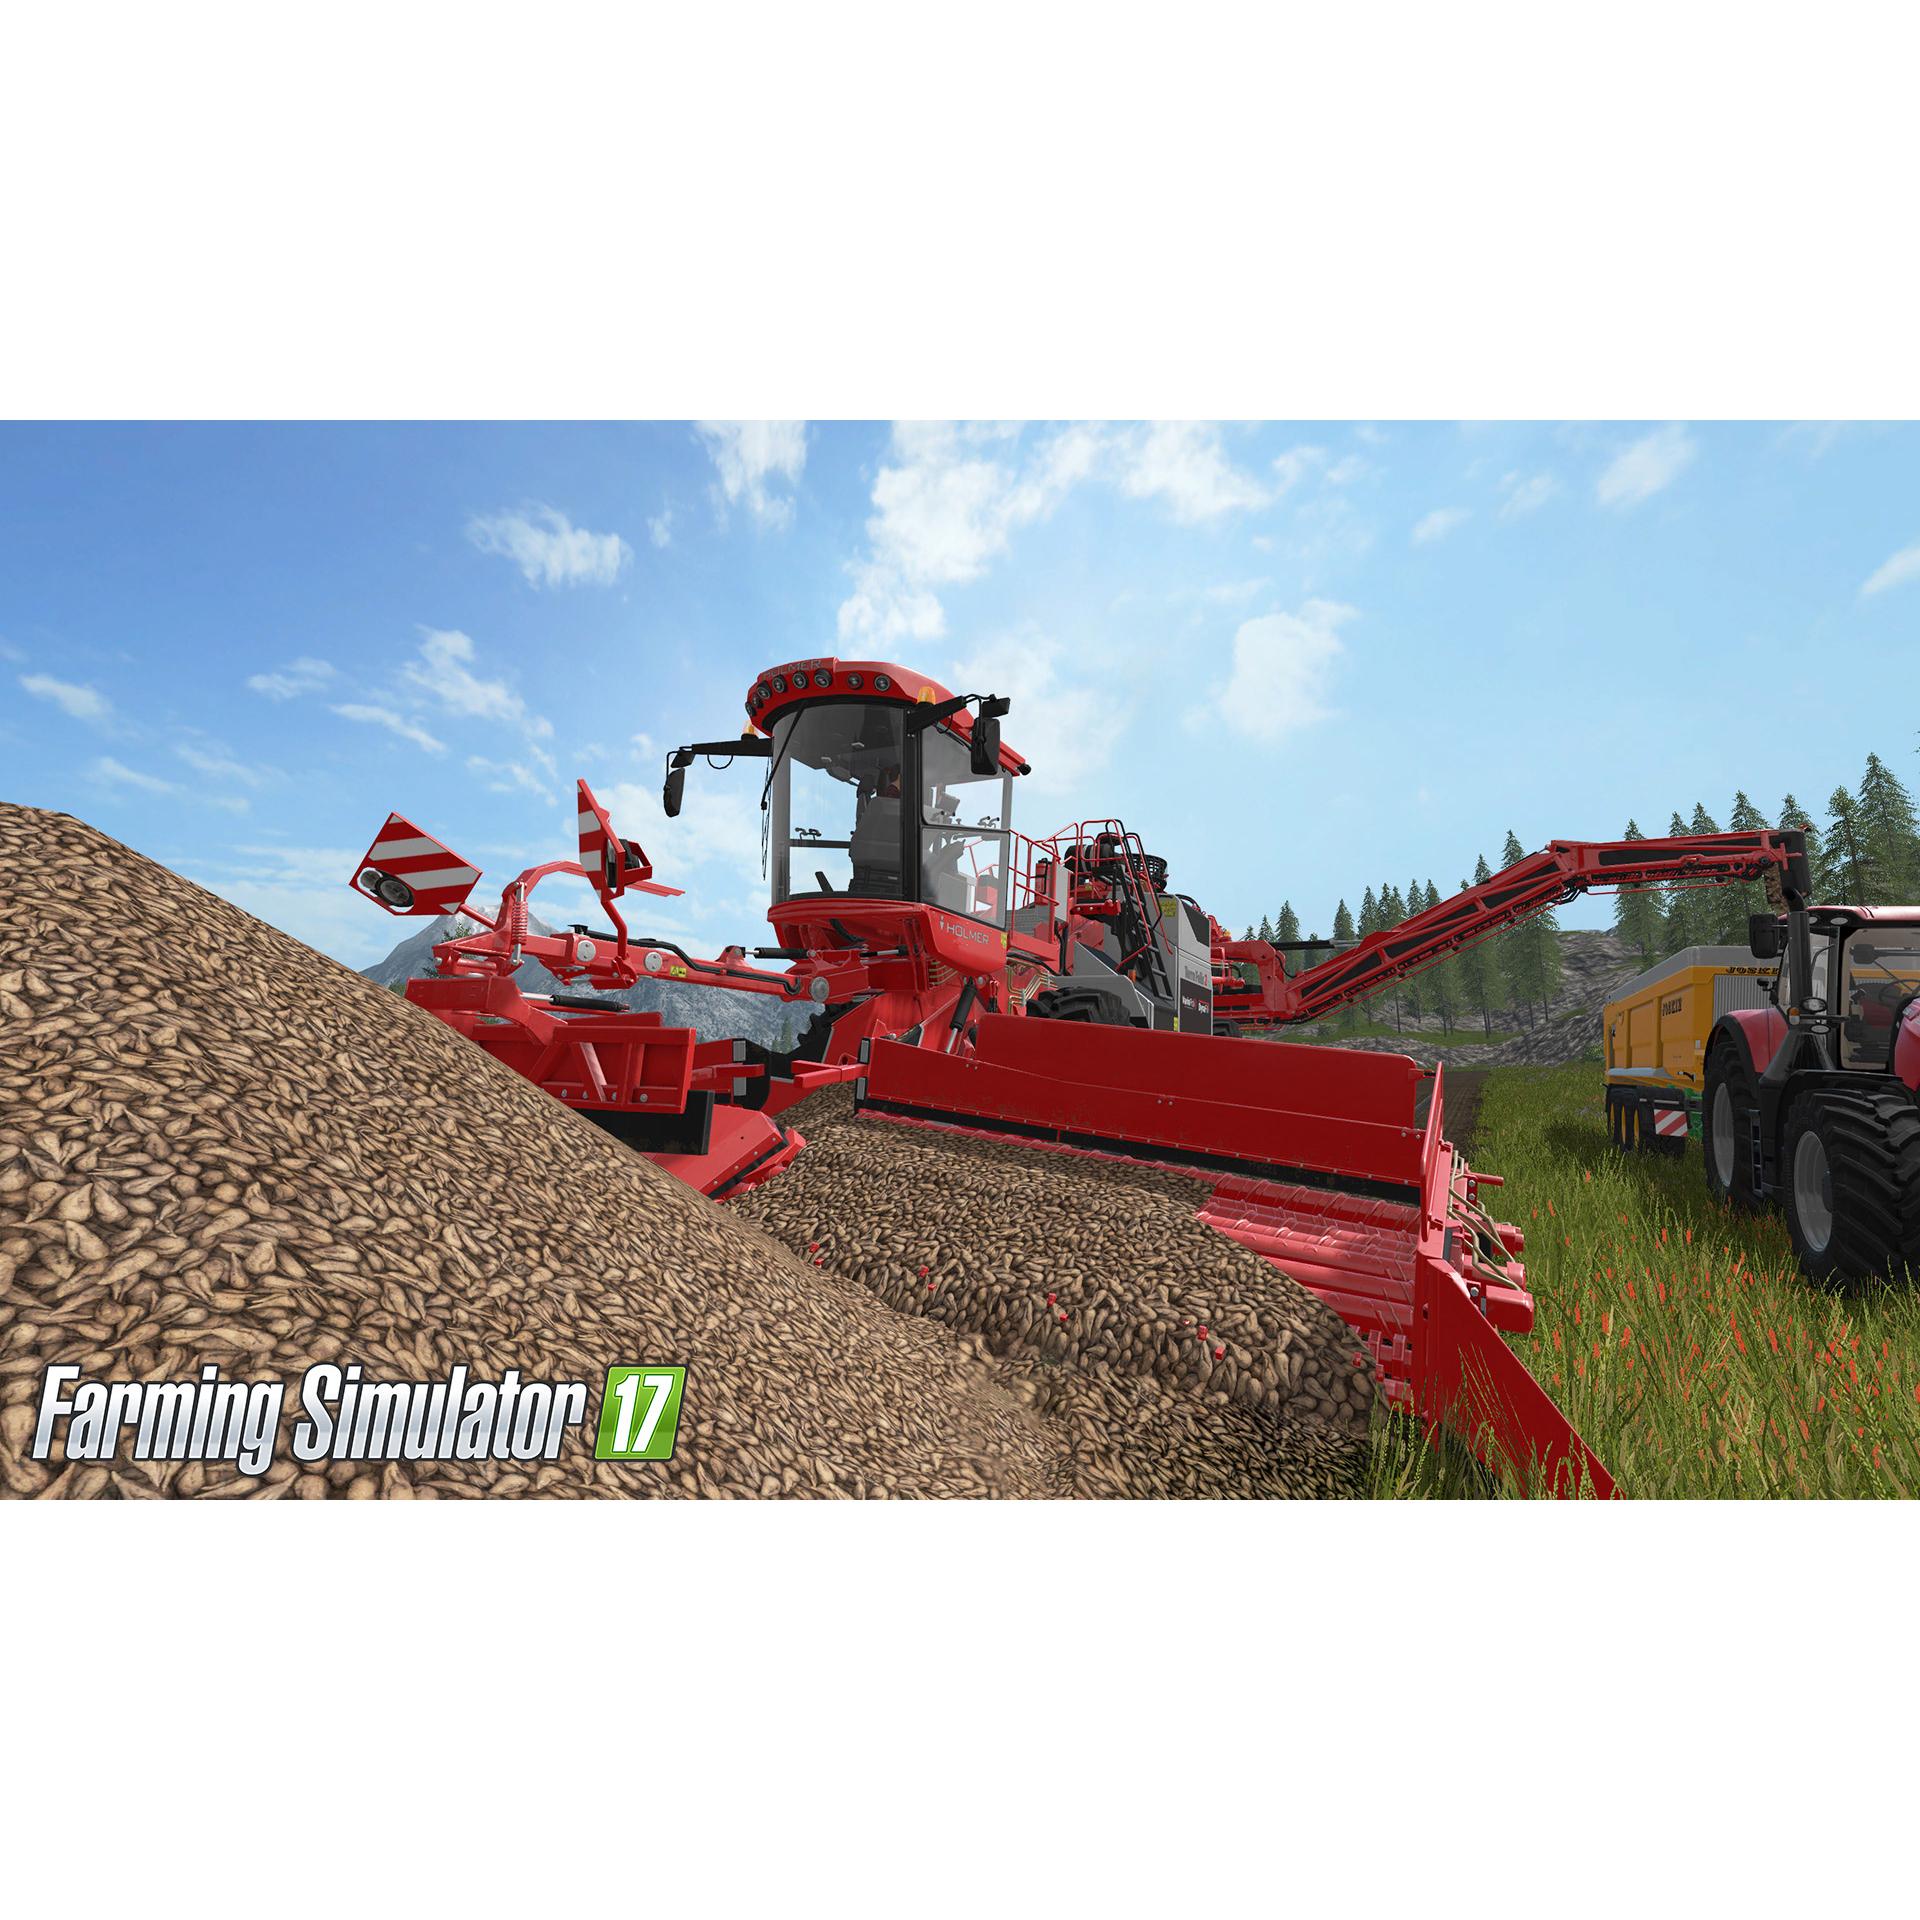 Farming simulator 17 Platinum edition, Xbox One 4